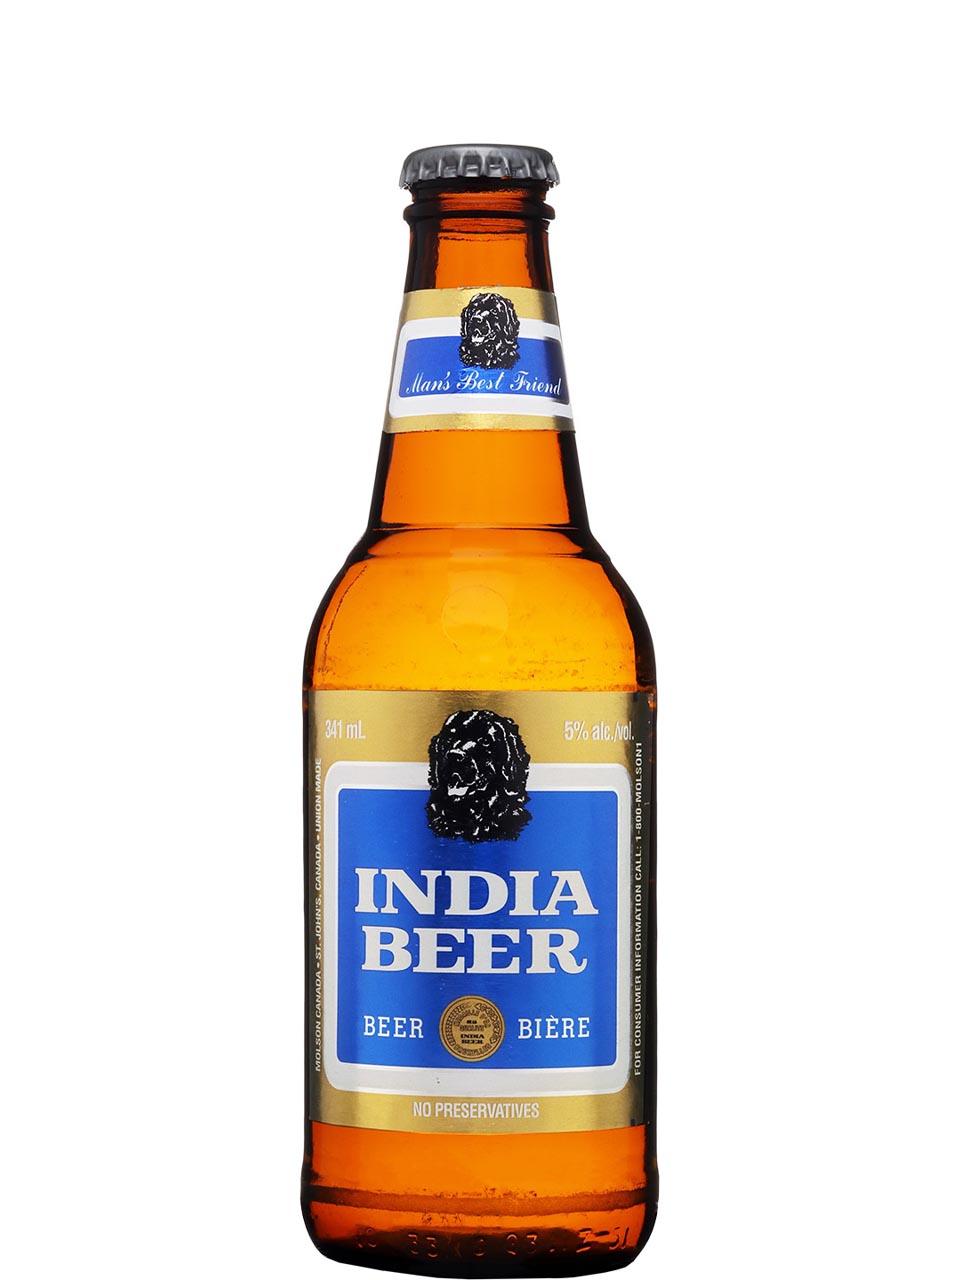 India Beer Bottles 12pk